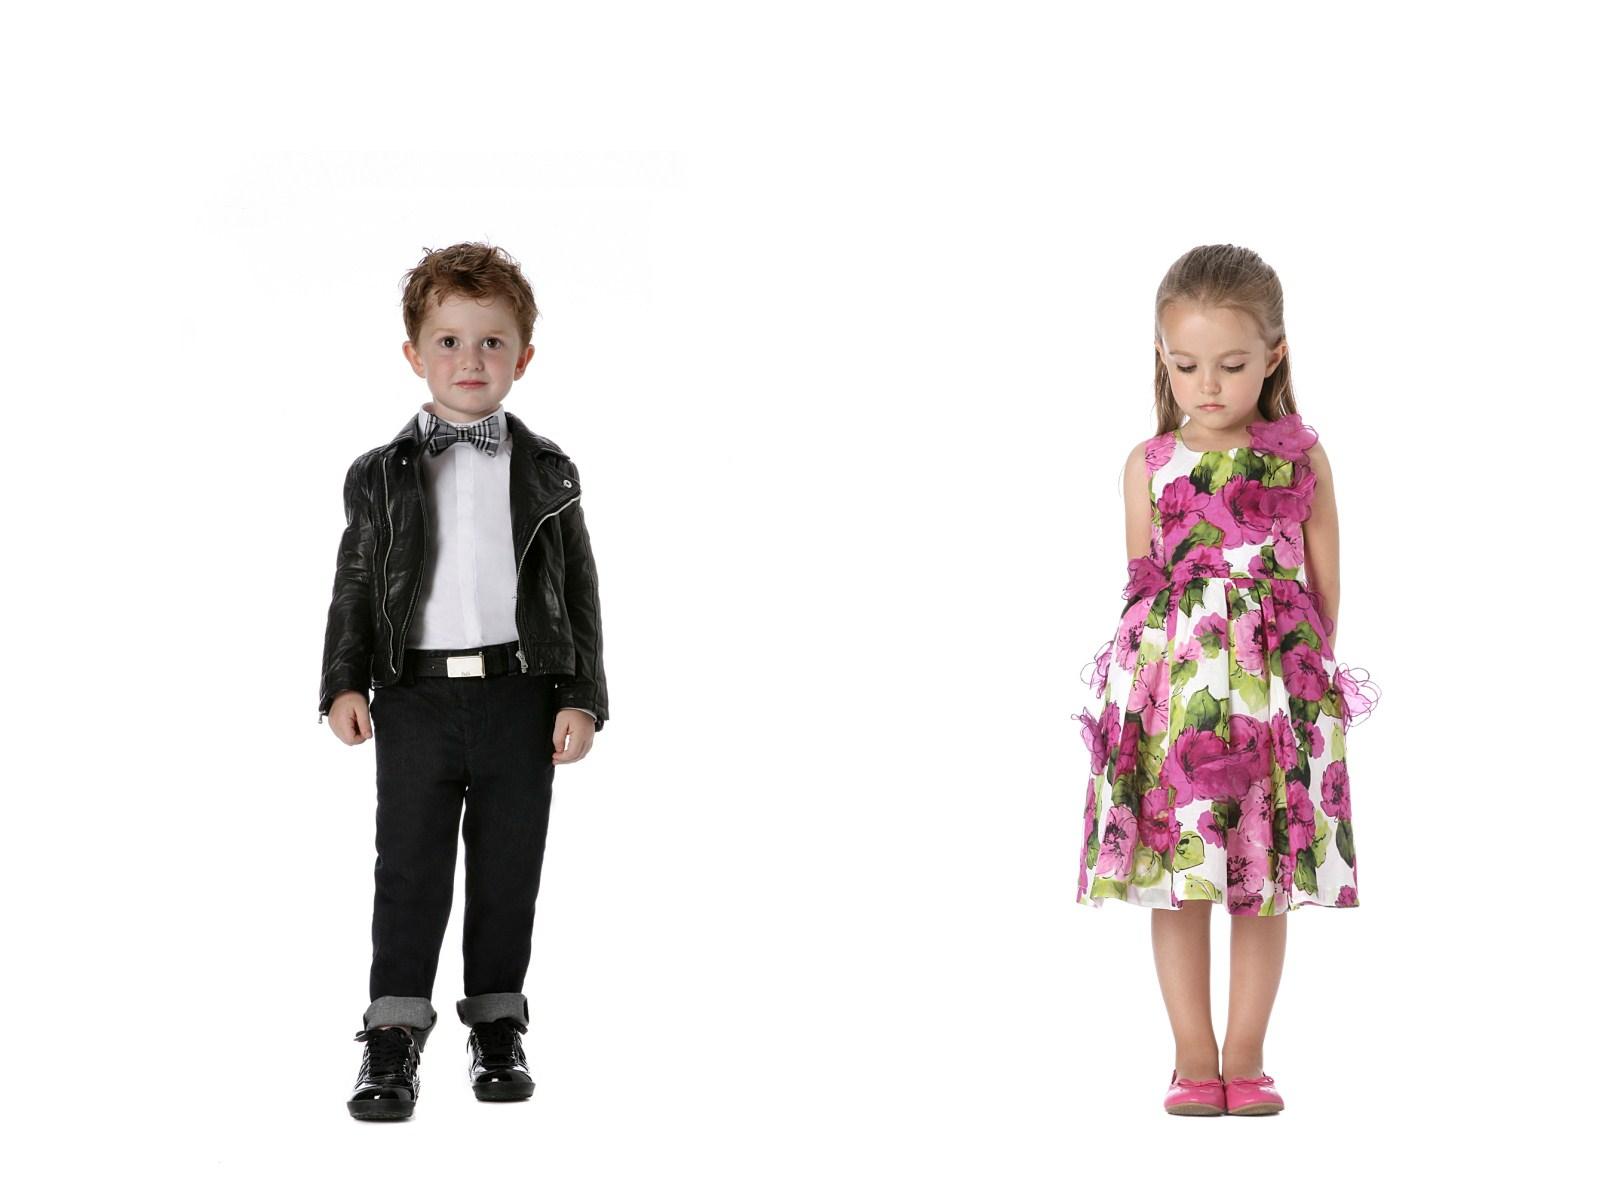 Одежда, D&G Kids ЦУМ, ул. Петровка, 2, тел. (495) 933 7300